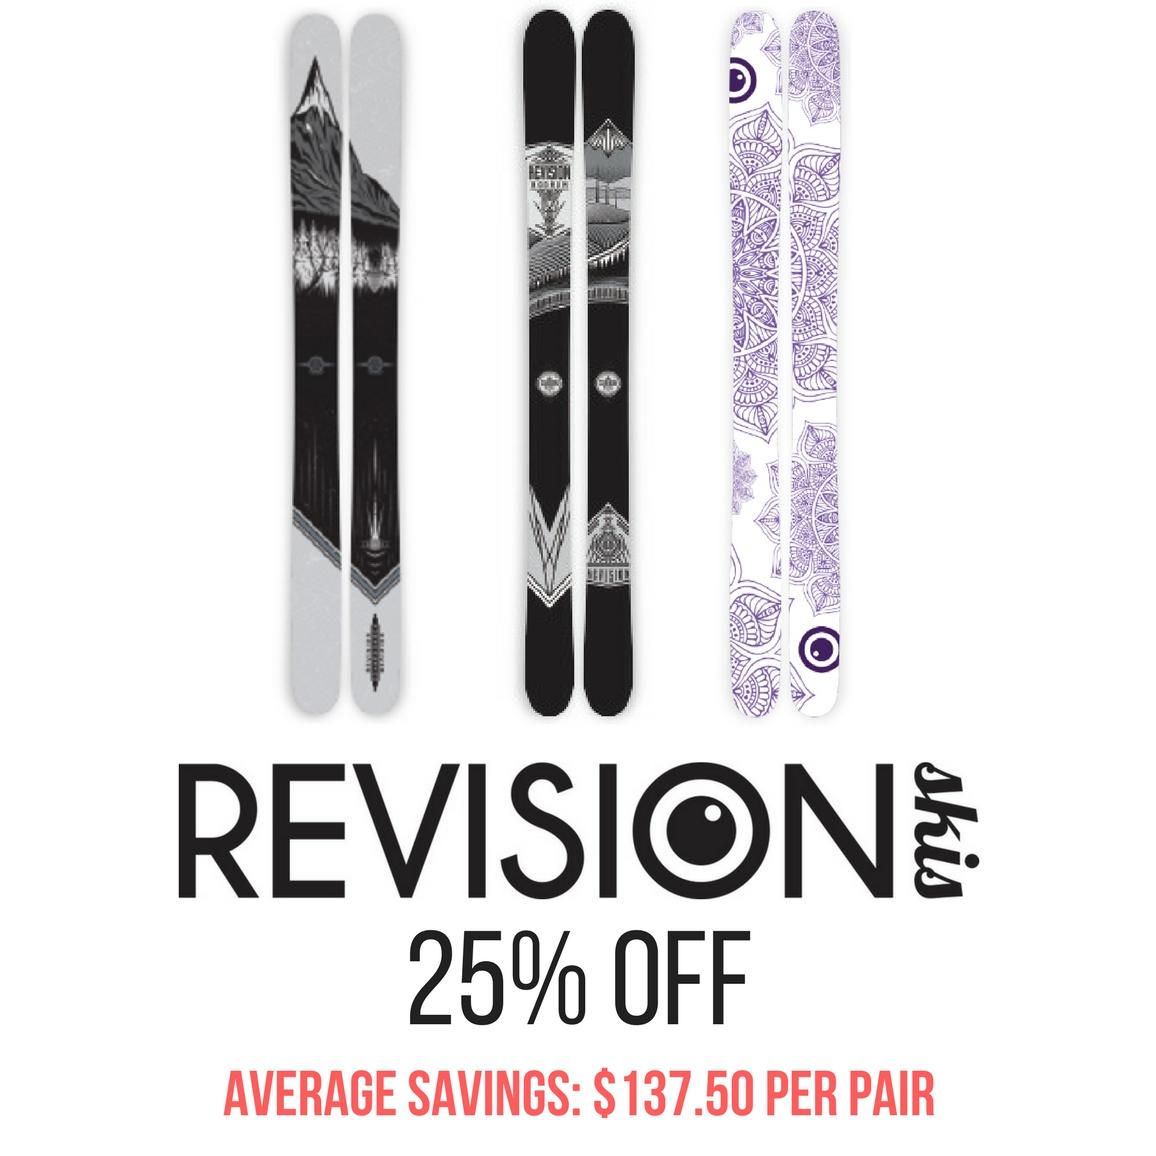 Revision Skis Membership Sample Product image.jpg